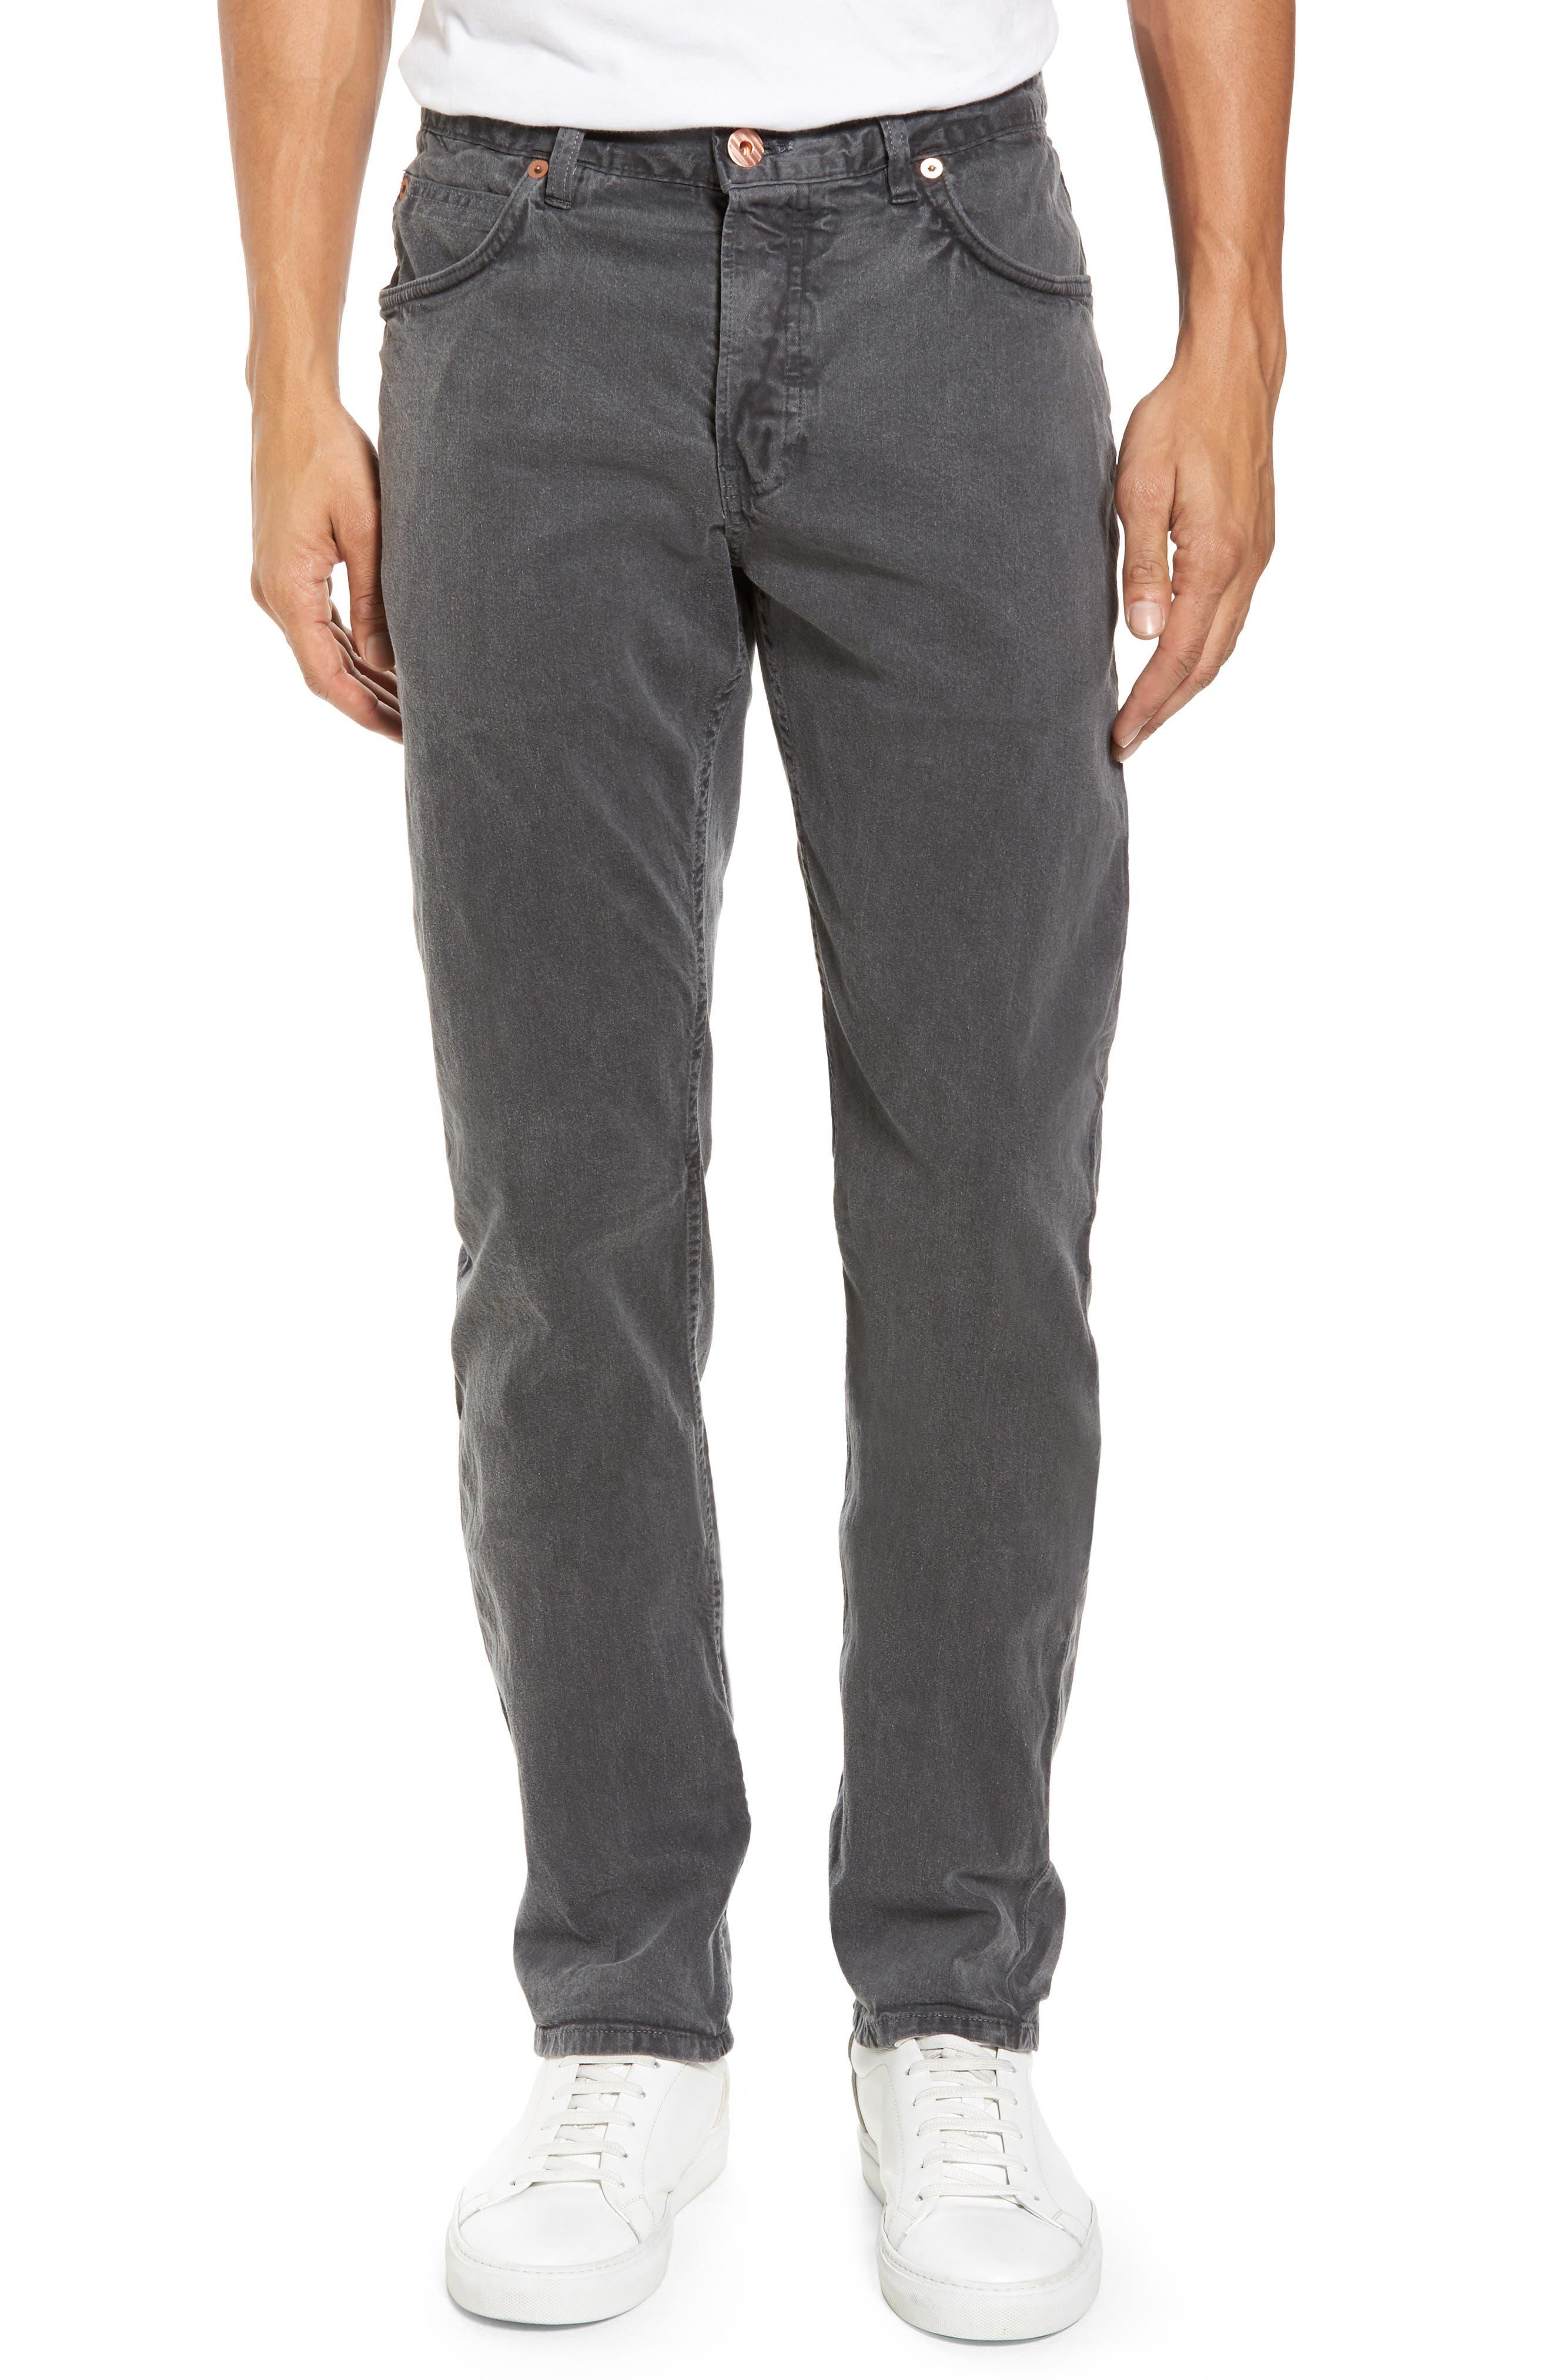 Alternate Image 1 Selected - Billy Reid Slim Fit Selvedge Jeans